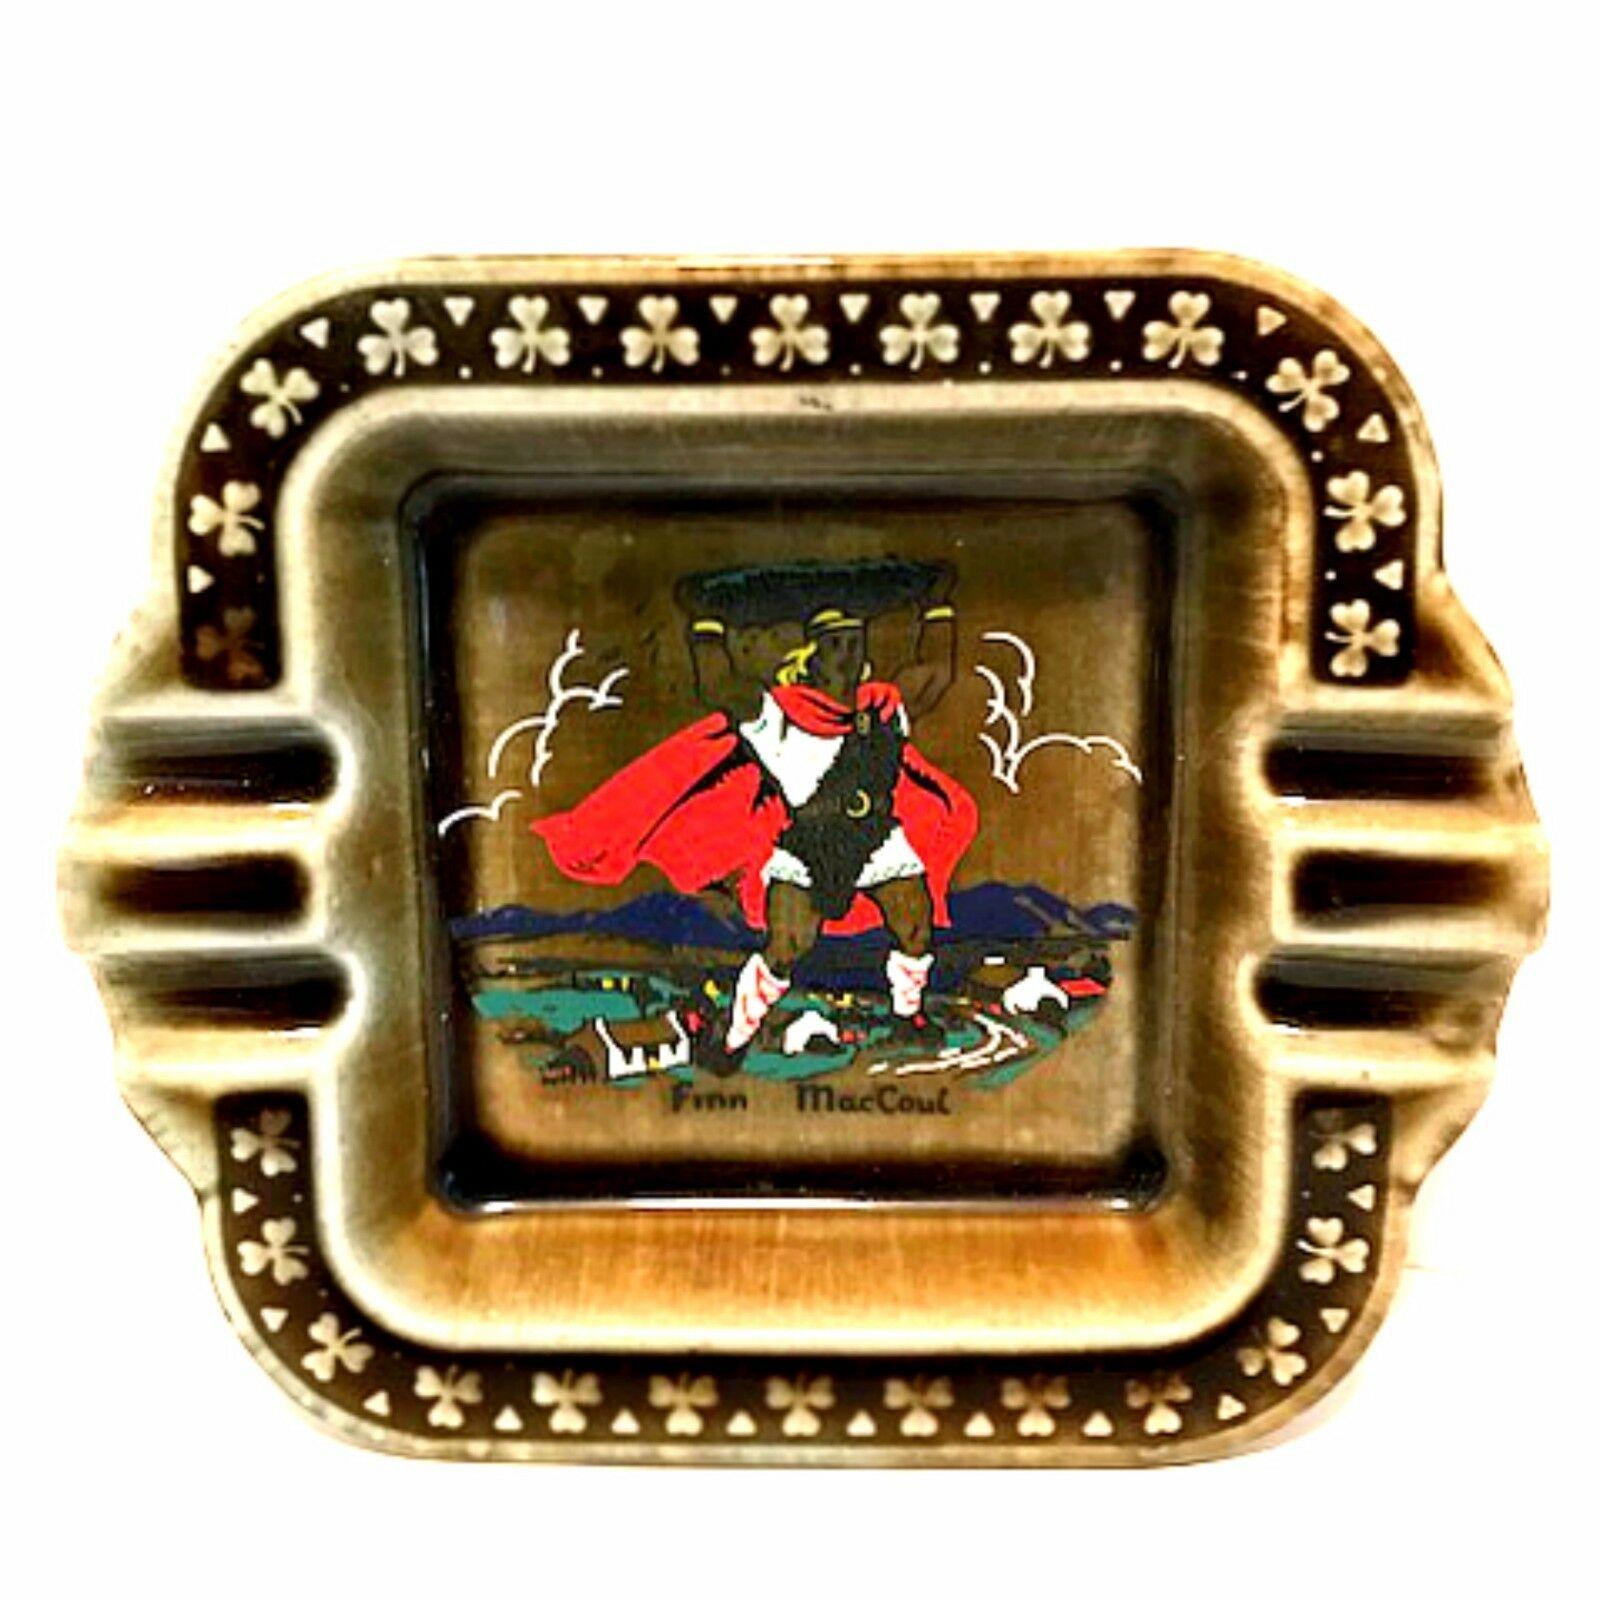 Vintage Irish Porcelain Ashtray Finn MacCoul Wade Pottery Ireland 6.25 in Long - $34.64